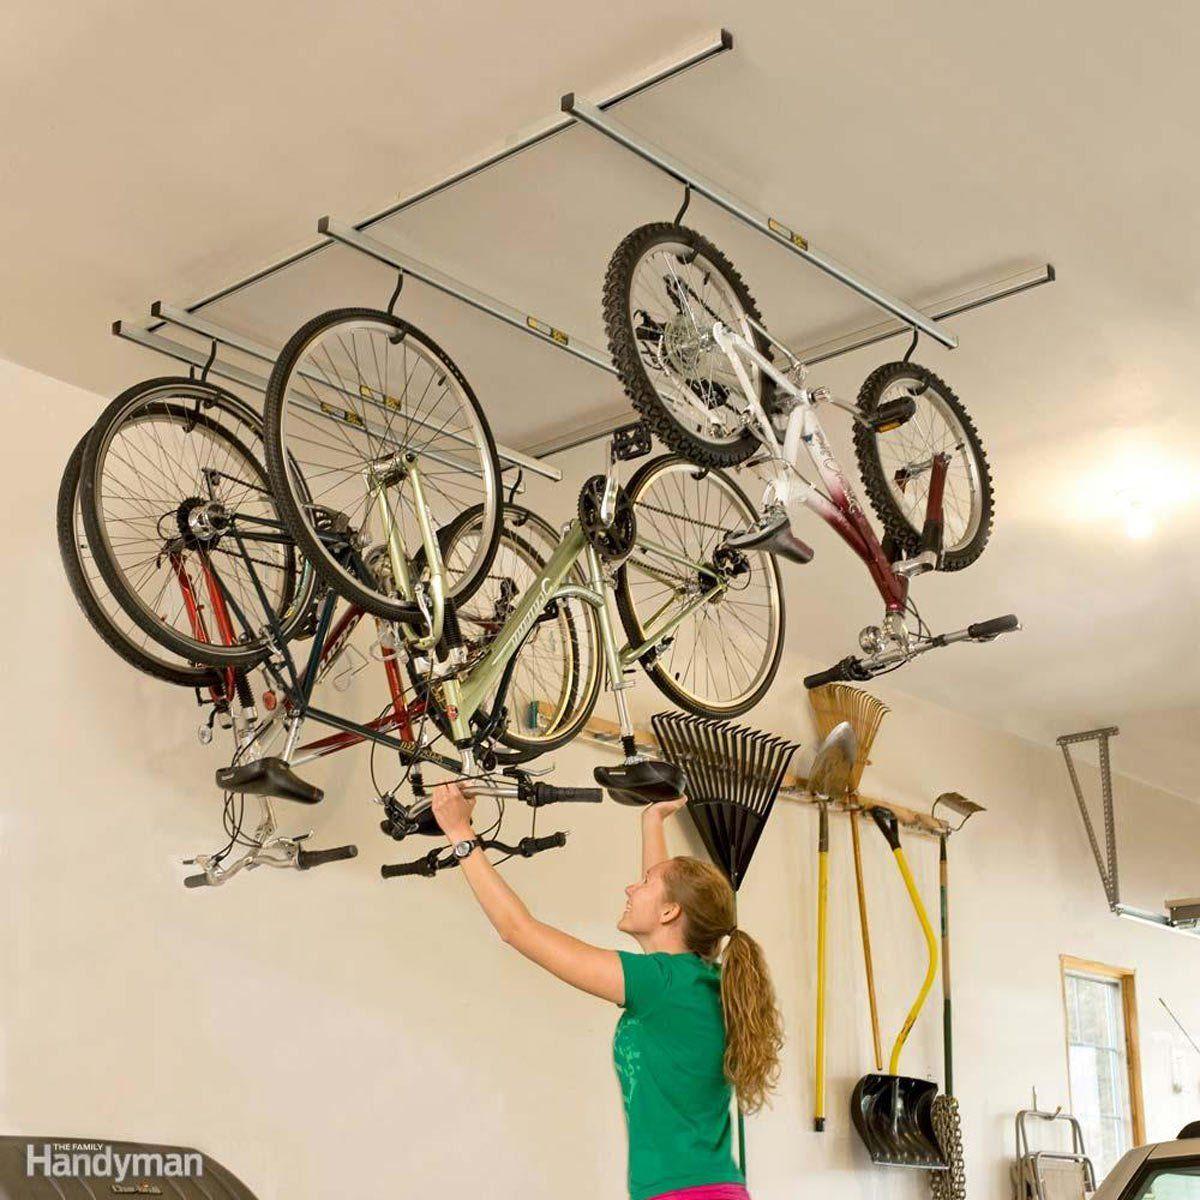 51 Brilliant Ways To Organize Your Garage Handyman